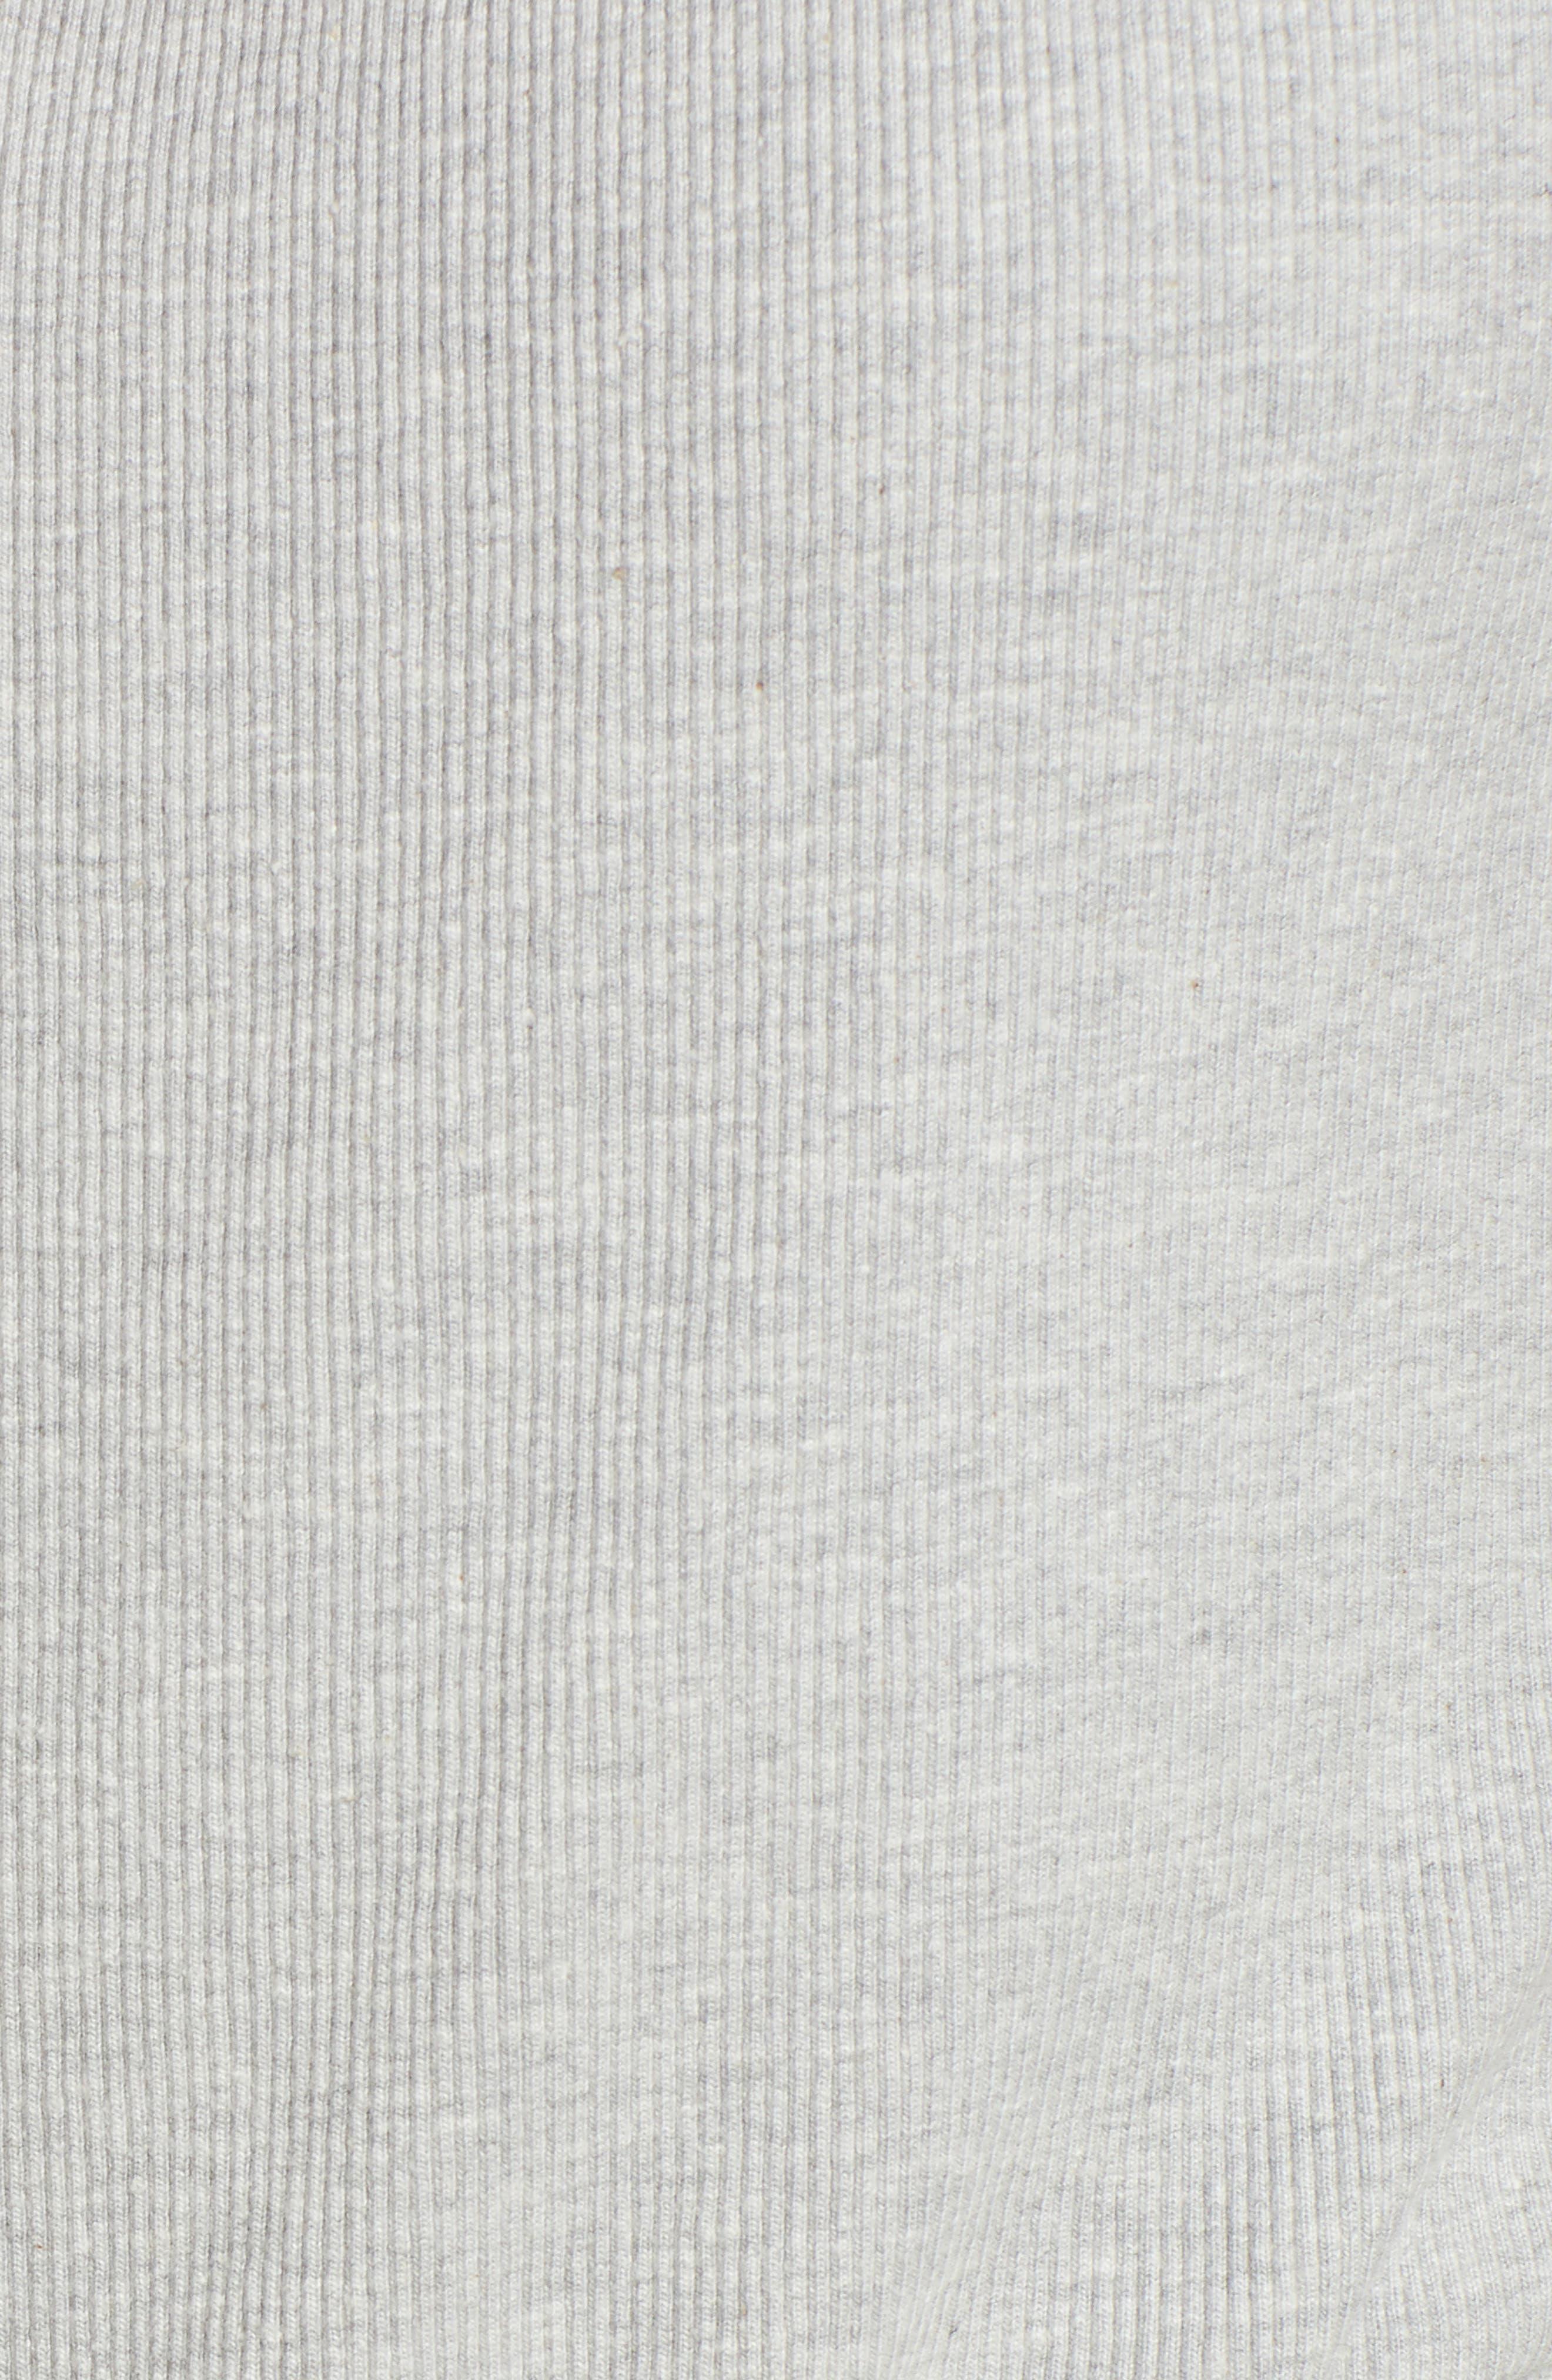 Malibu Hooded Romper,                             Alternate thumbnail 6, color,                             Light Grey Marl/ Peacoat